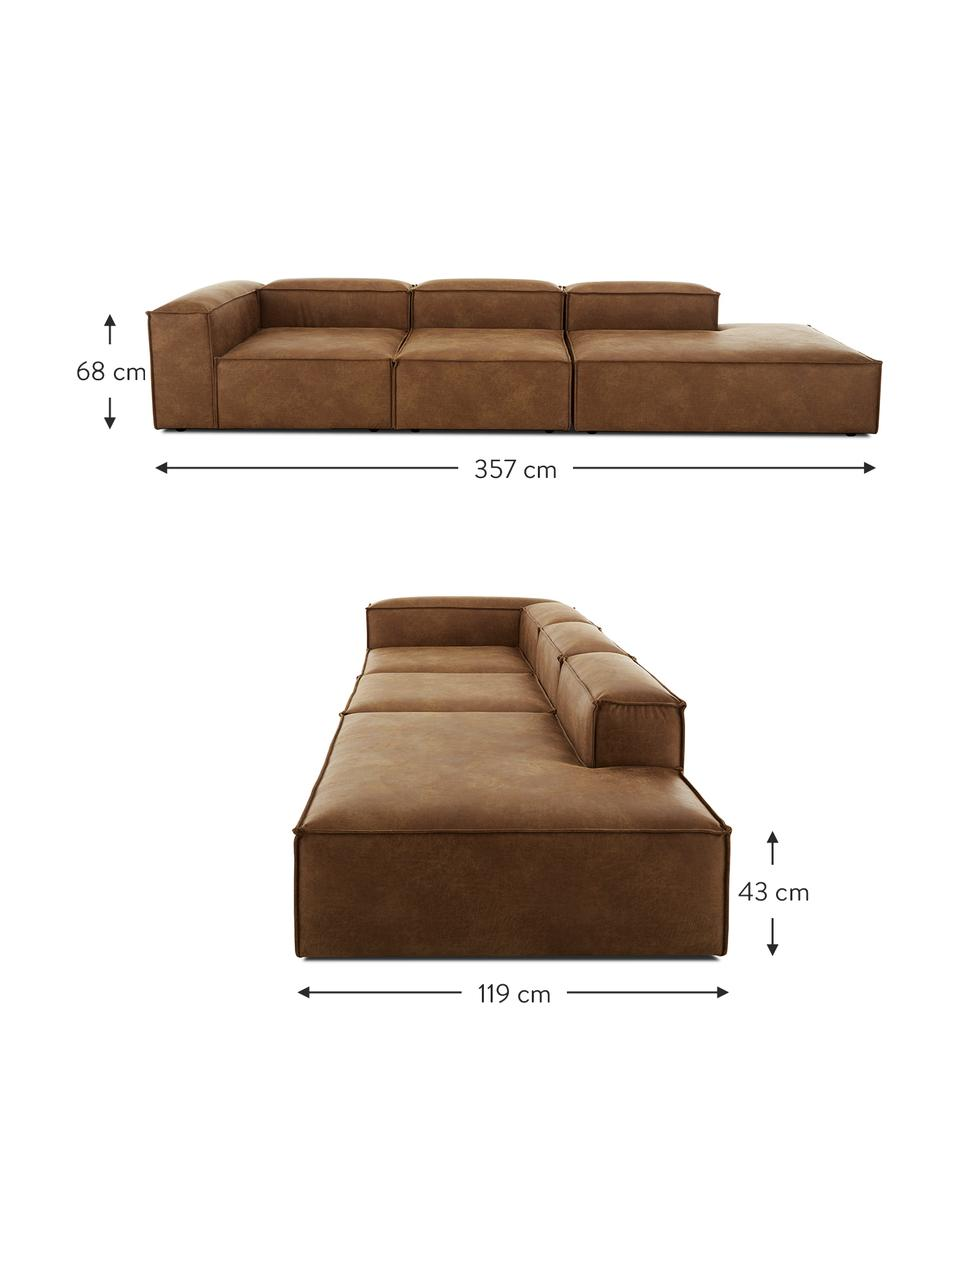 Modulaire XL chaise longue Lennon in bruin van gerecycled leer, Bekleding: gerecycled leer (70% leer, Frame: massief grenenhout, multi, Poten: kunststof De poten bevind, Leer bruin, B 357 x D 119 cm